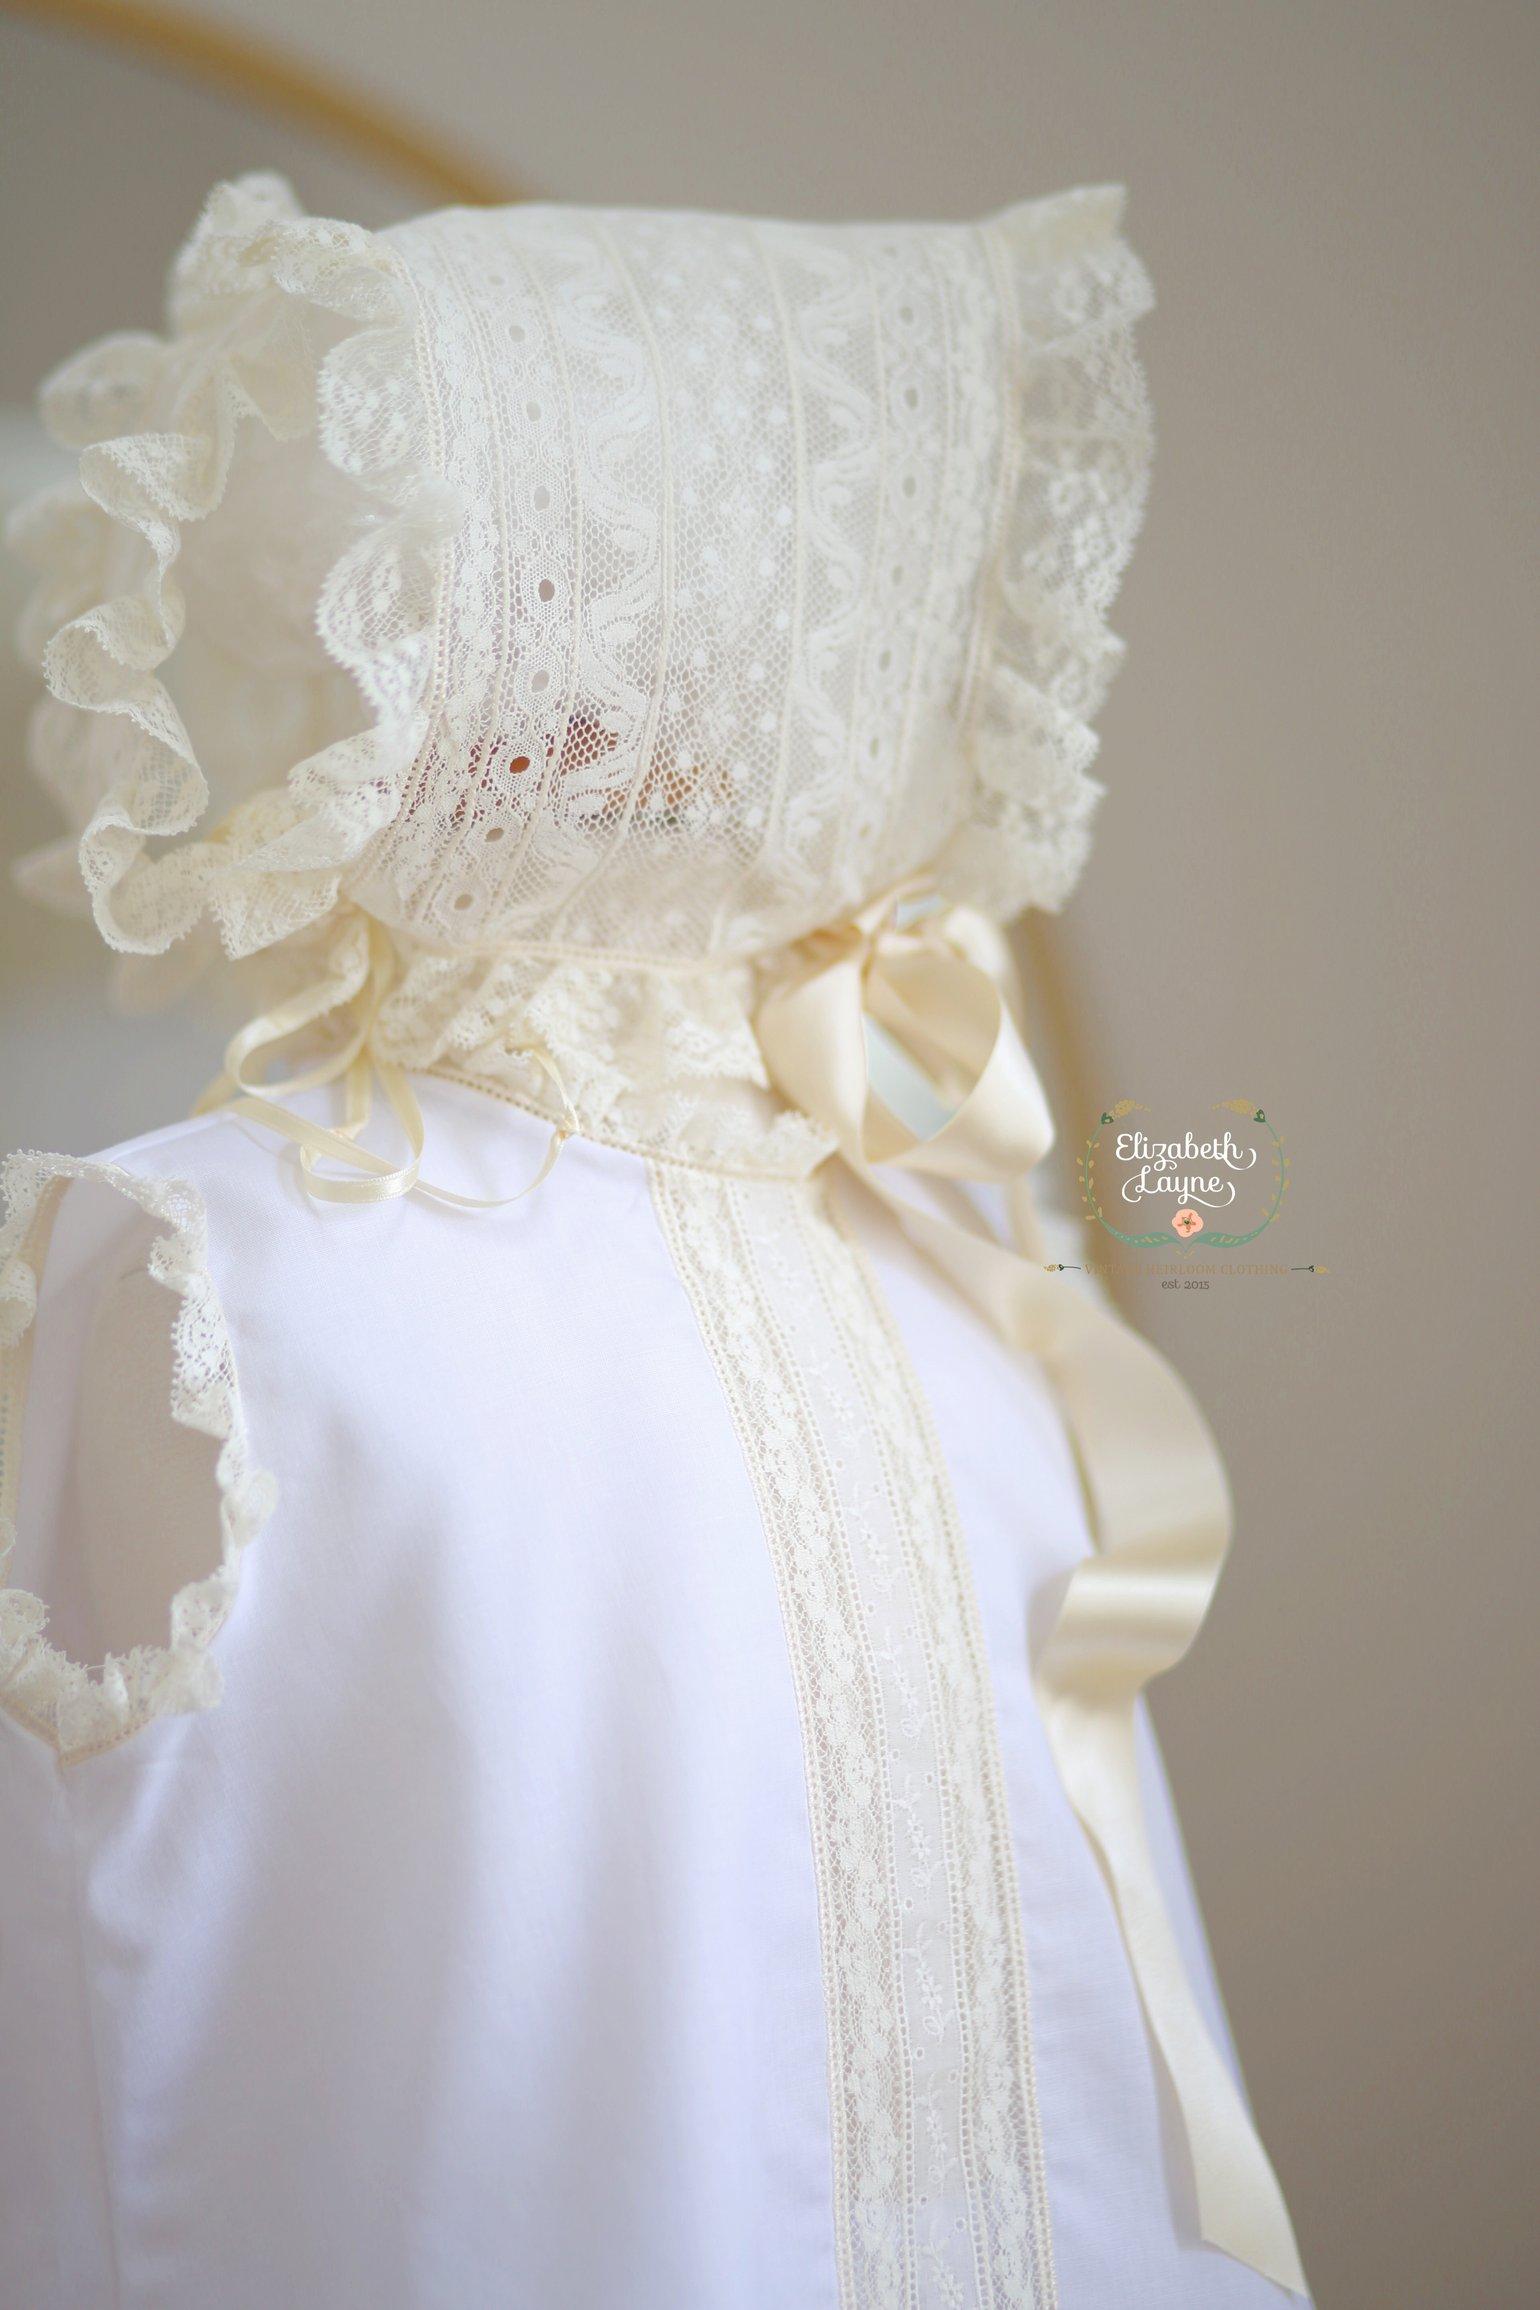 Image of New Lyla Heirloom Dress & Bonnet Set